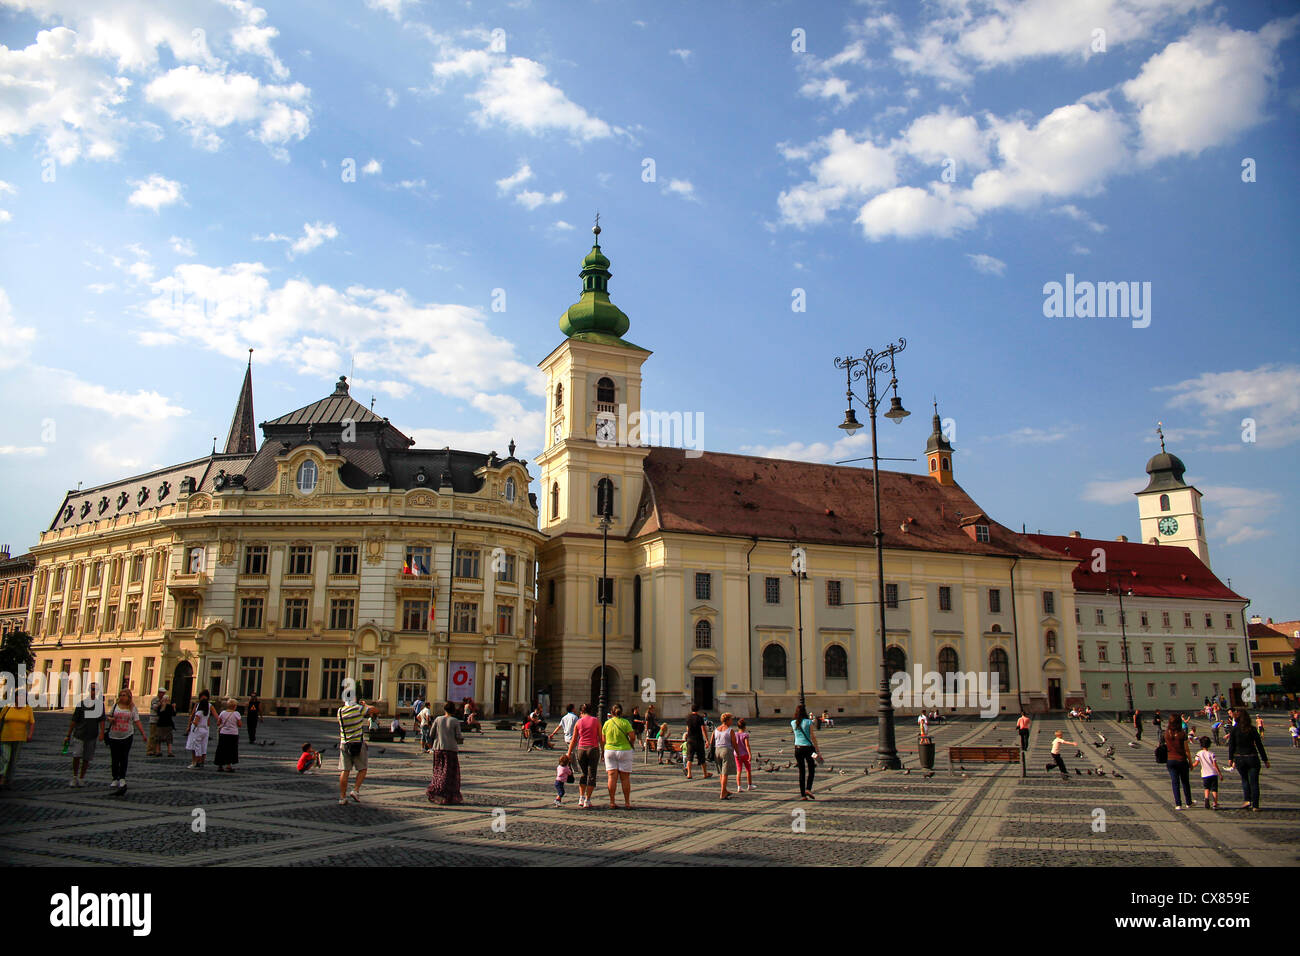 Mare square, Sibiu, Transylvania, Romania - Stock Image